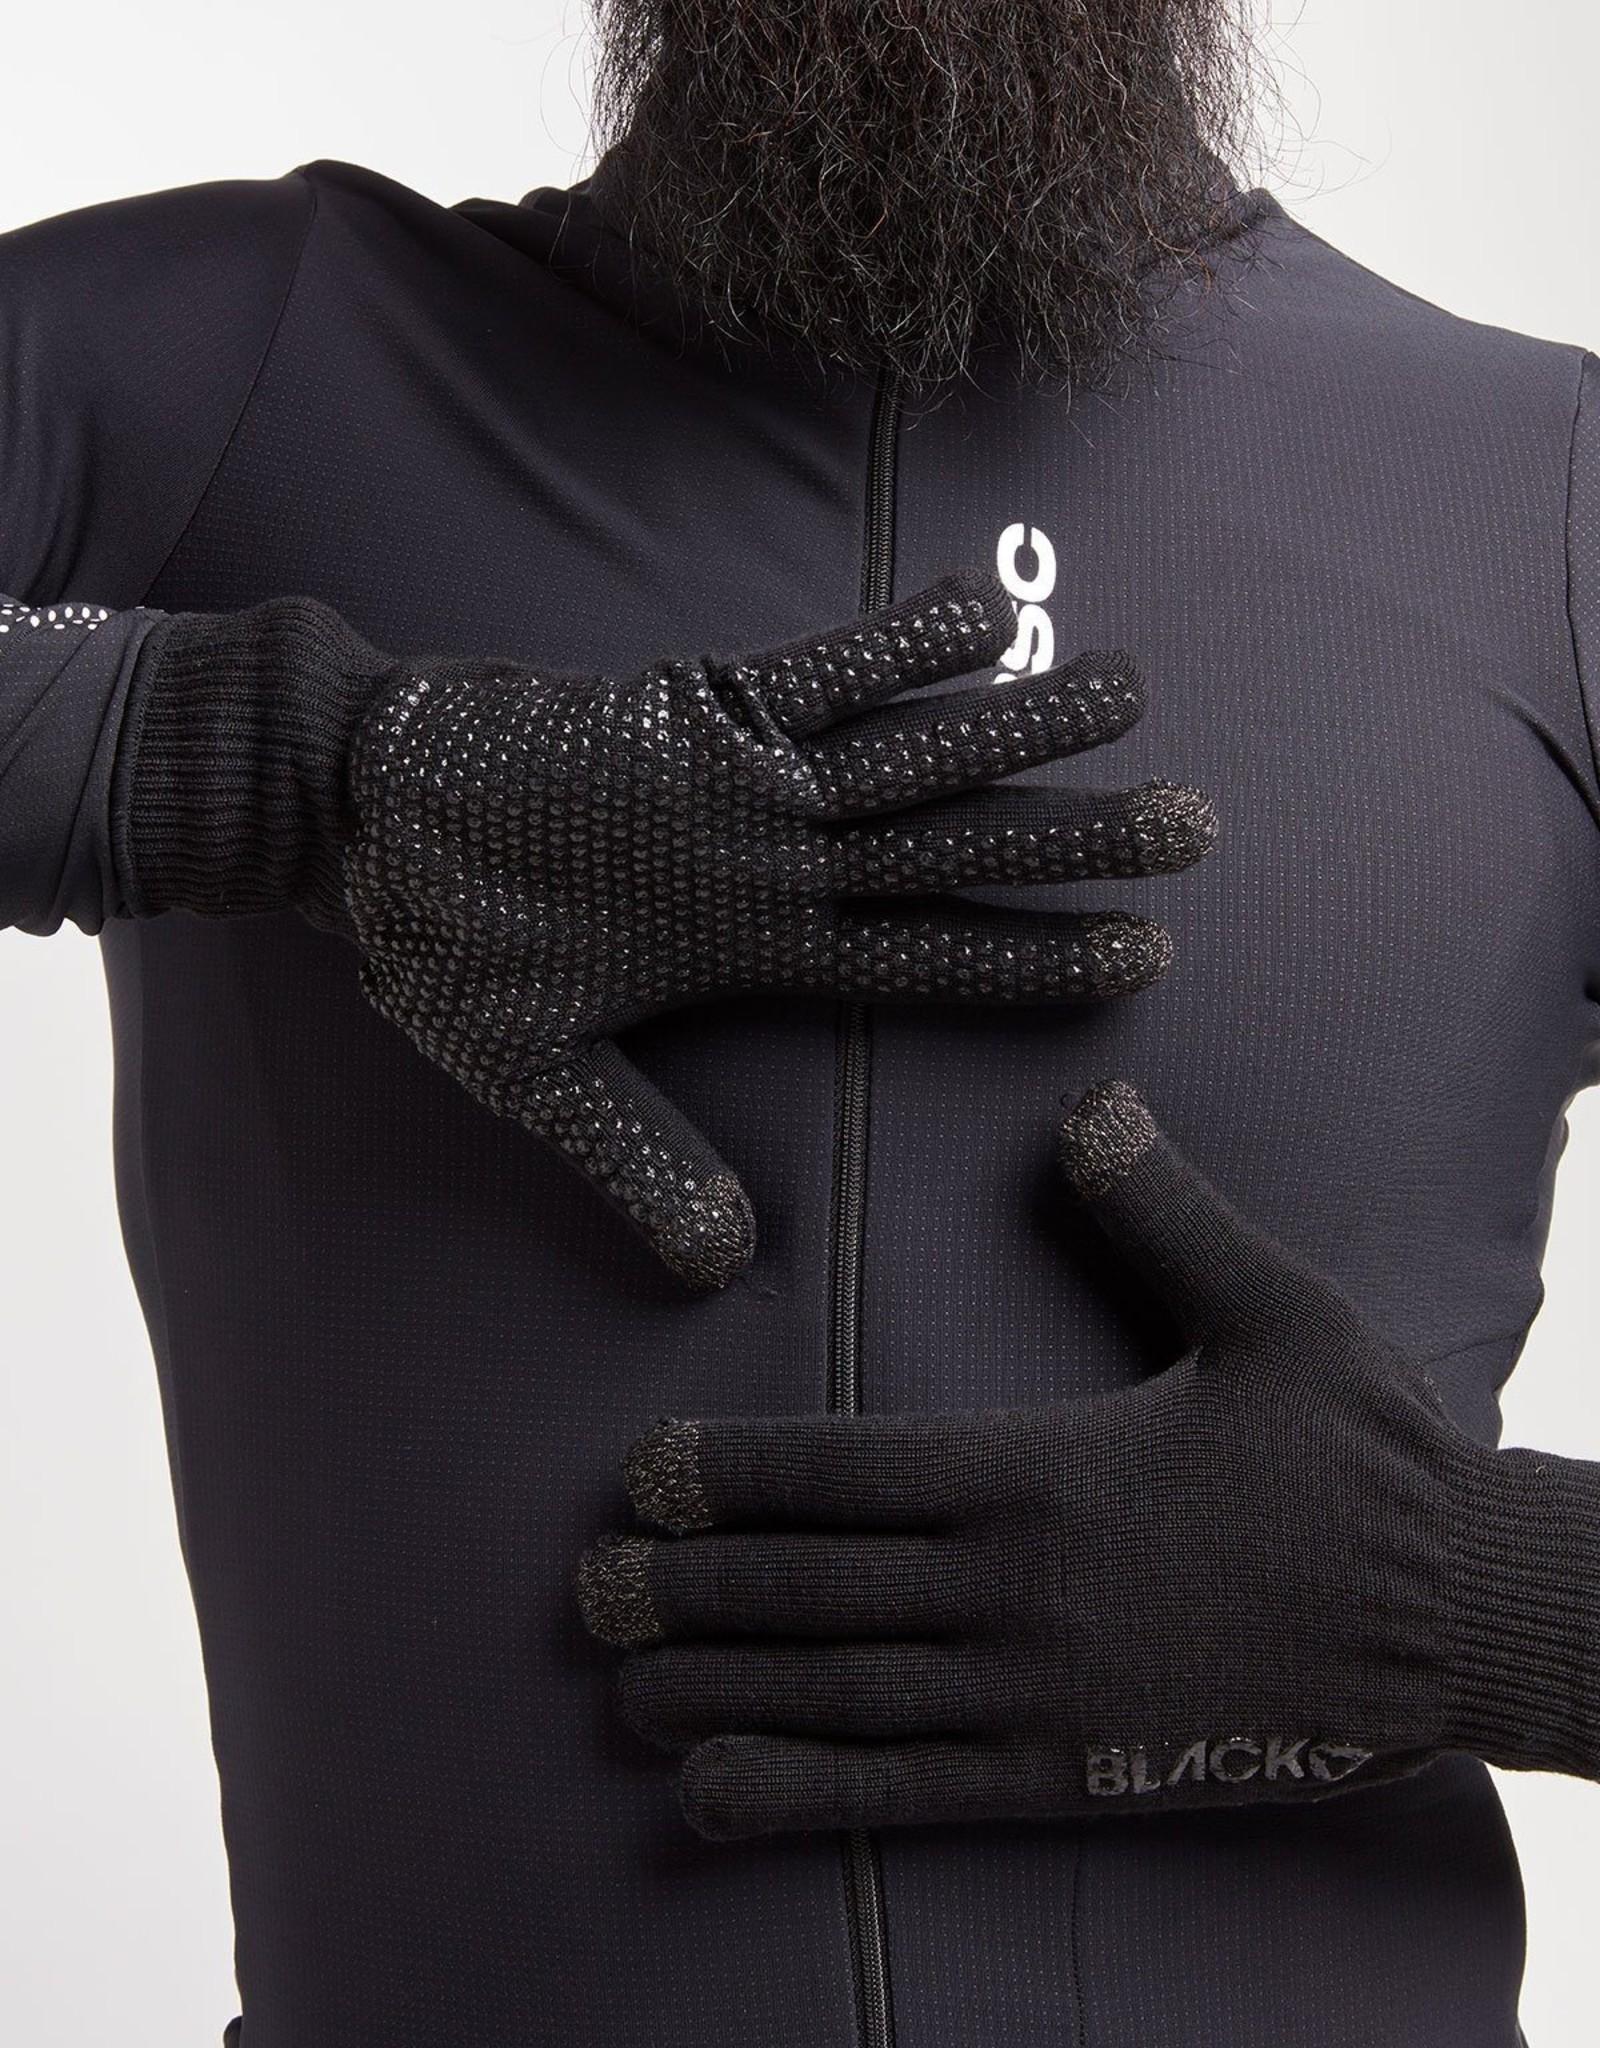 Black Sheep Cycling Elements Merino Fietshandschoenen